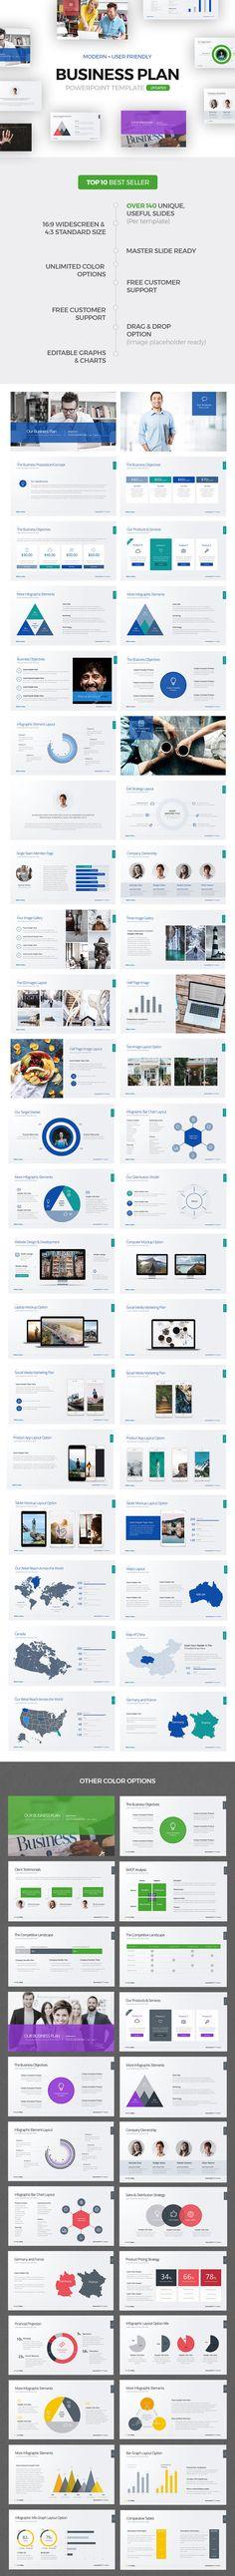 the 35 best portfolio powerpoint templates images on pinterest